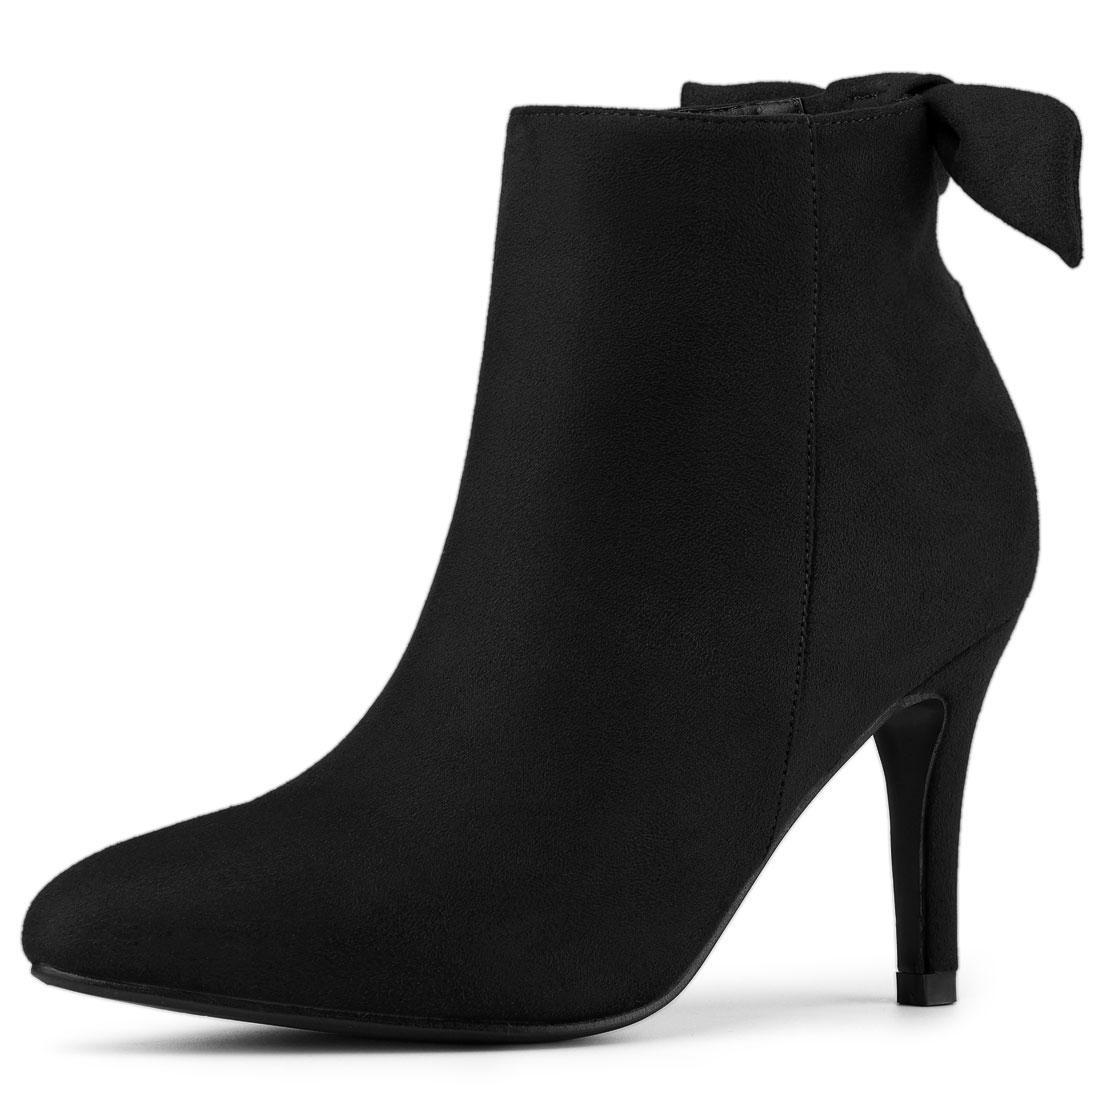 Allegra K Women's Pointed Toe Stiletto Heel Ankle Boots Black US 8